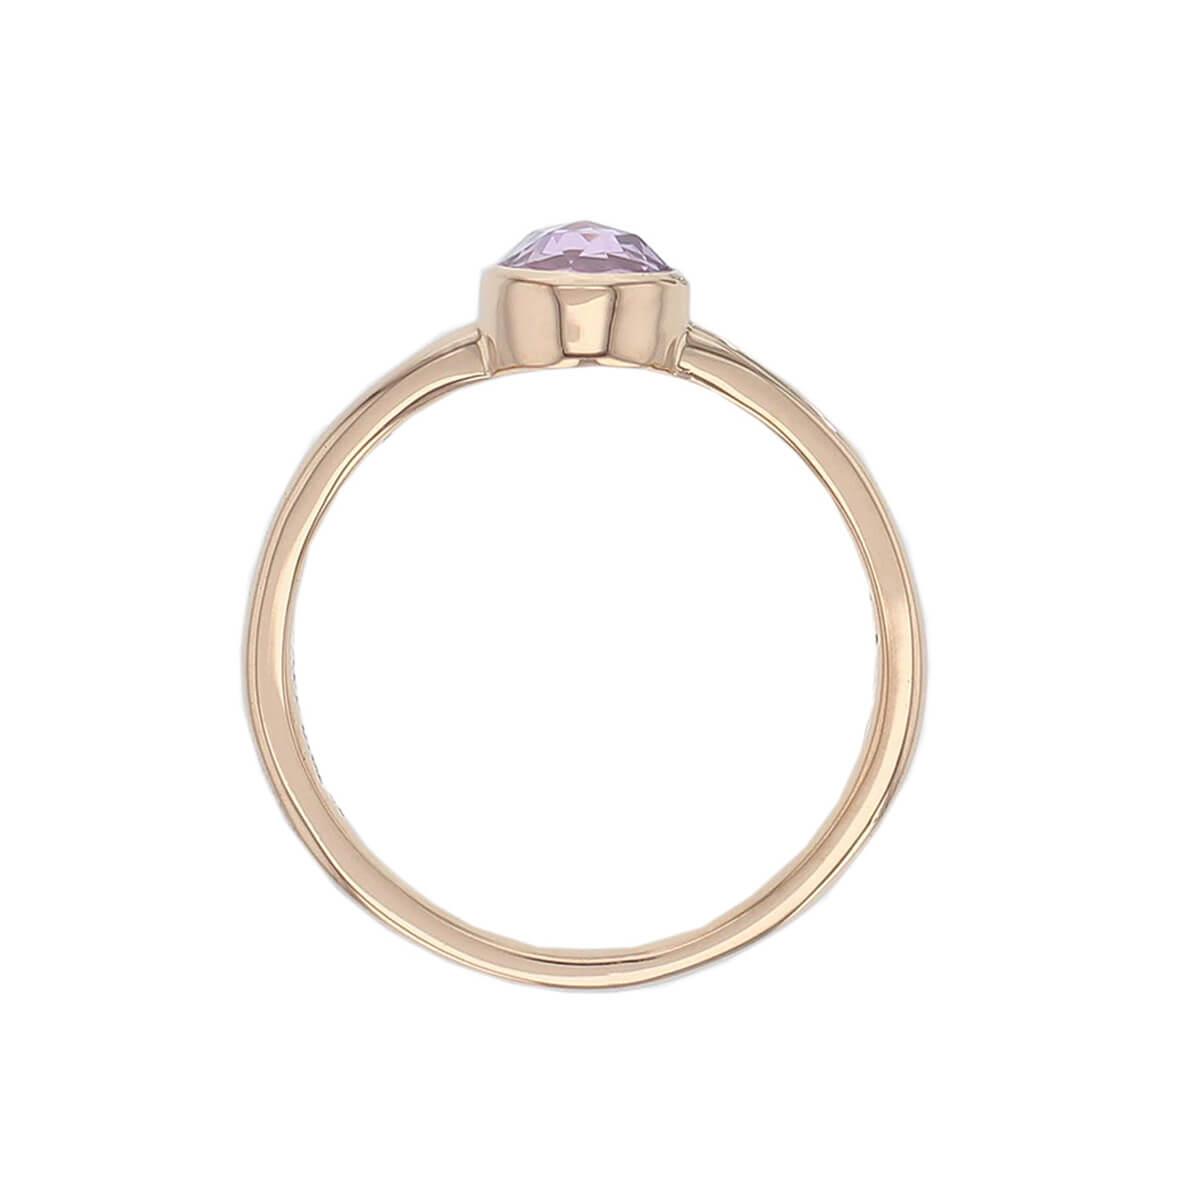 Kandy 18ct rose gold purple round rose cut sapphire gemstone ladies dress ring, designer jewellery, gem, jewelry, handmade by Faller, Londonderry, Northern Ireland, Irish hand crafted